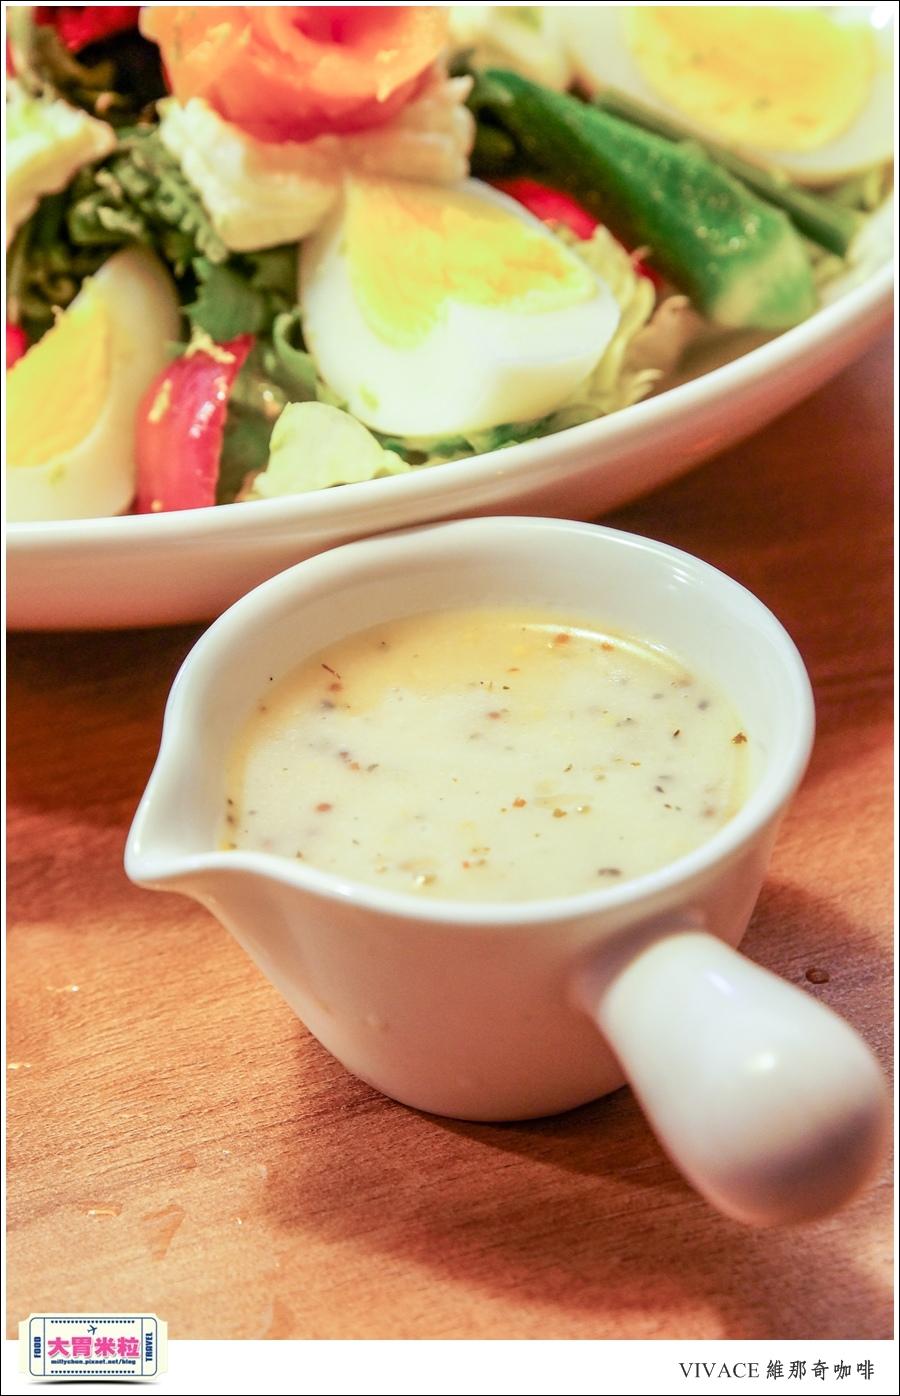 Hellmann's 康寶美玉白汁全台美味沙拉之旅x維那奇VIVACE咖啡@高雄早午餐推薦@大胃米粒0032.jpg